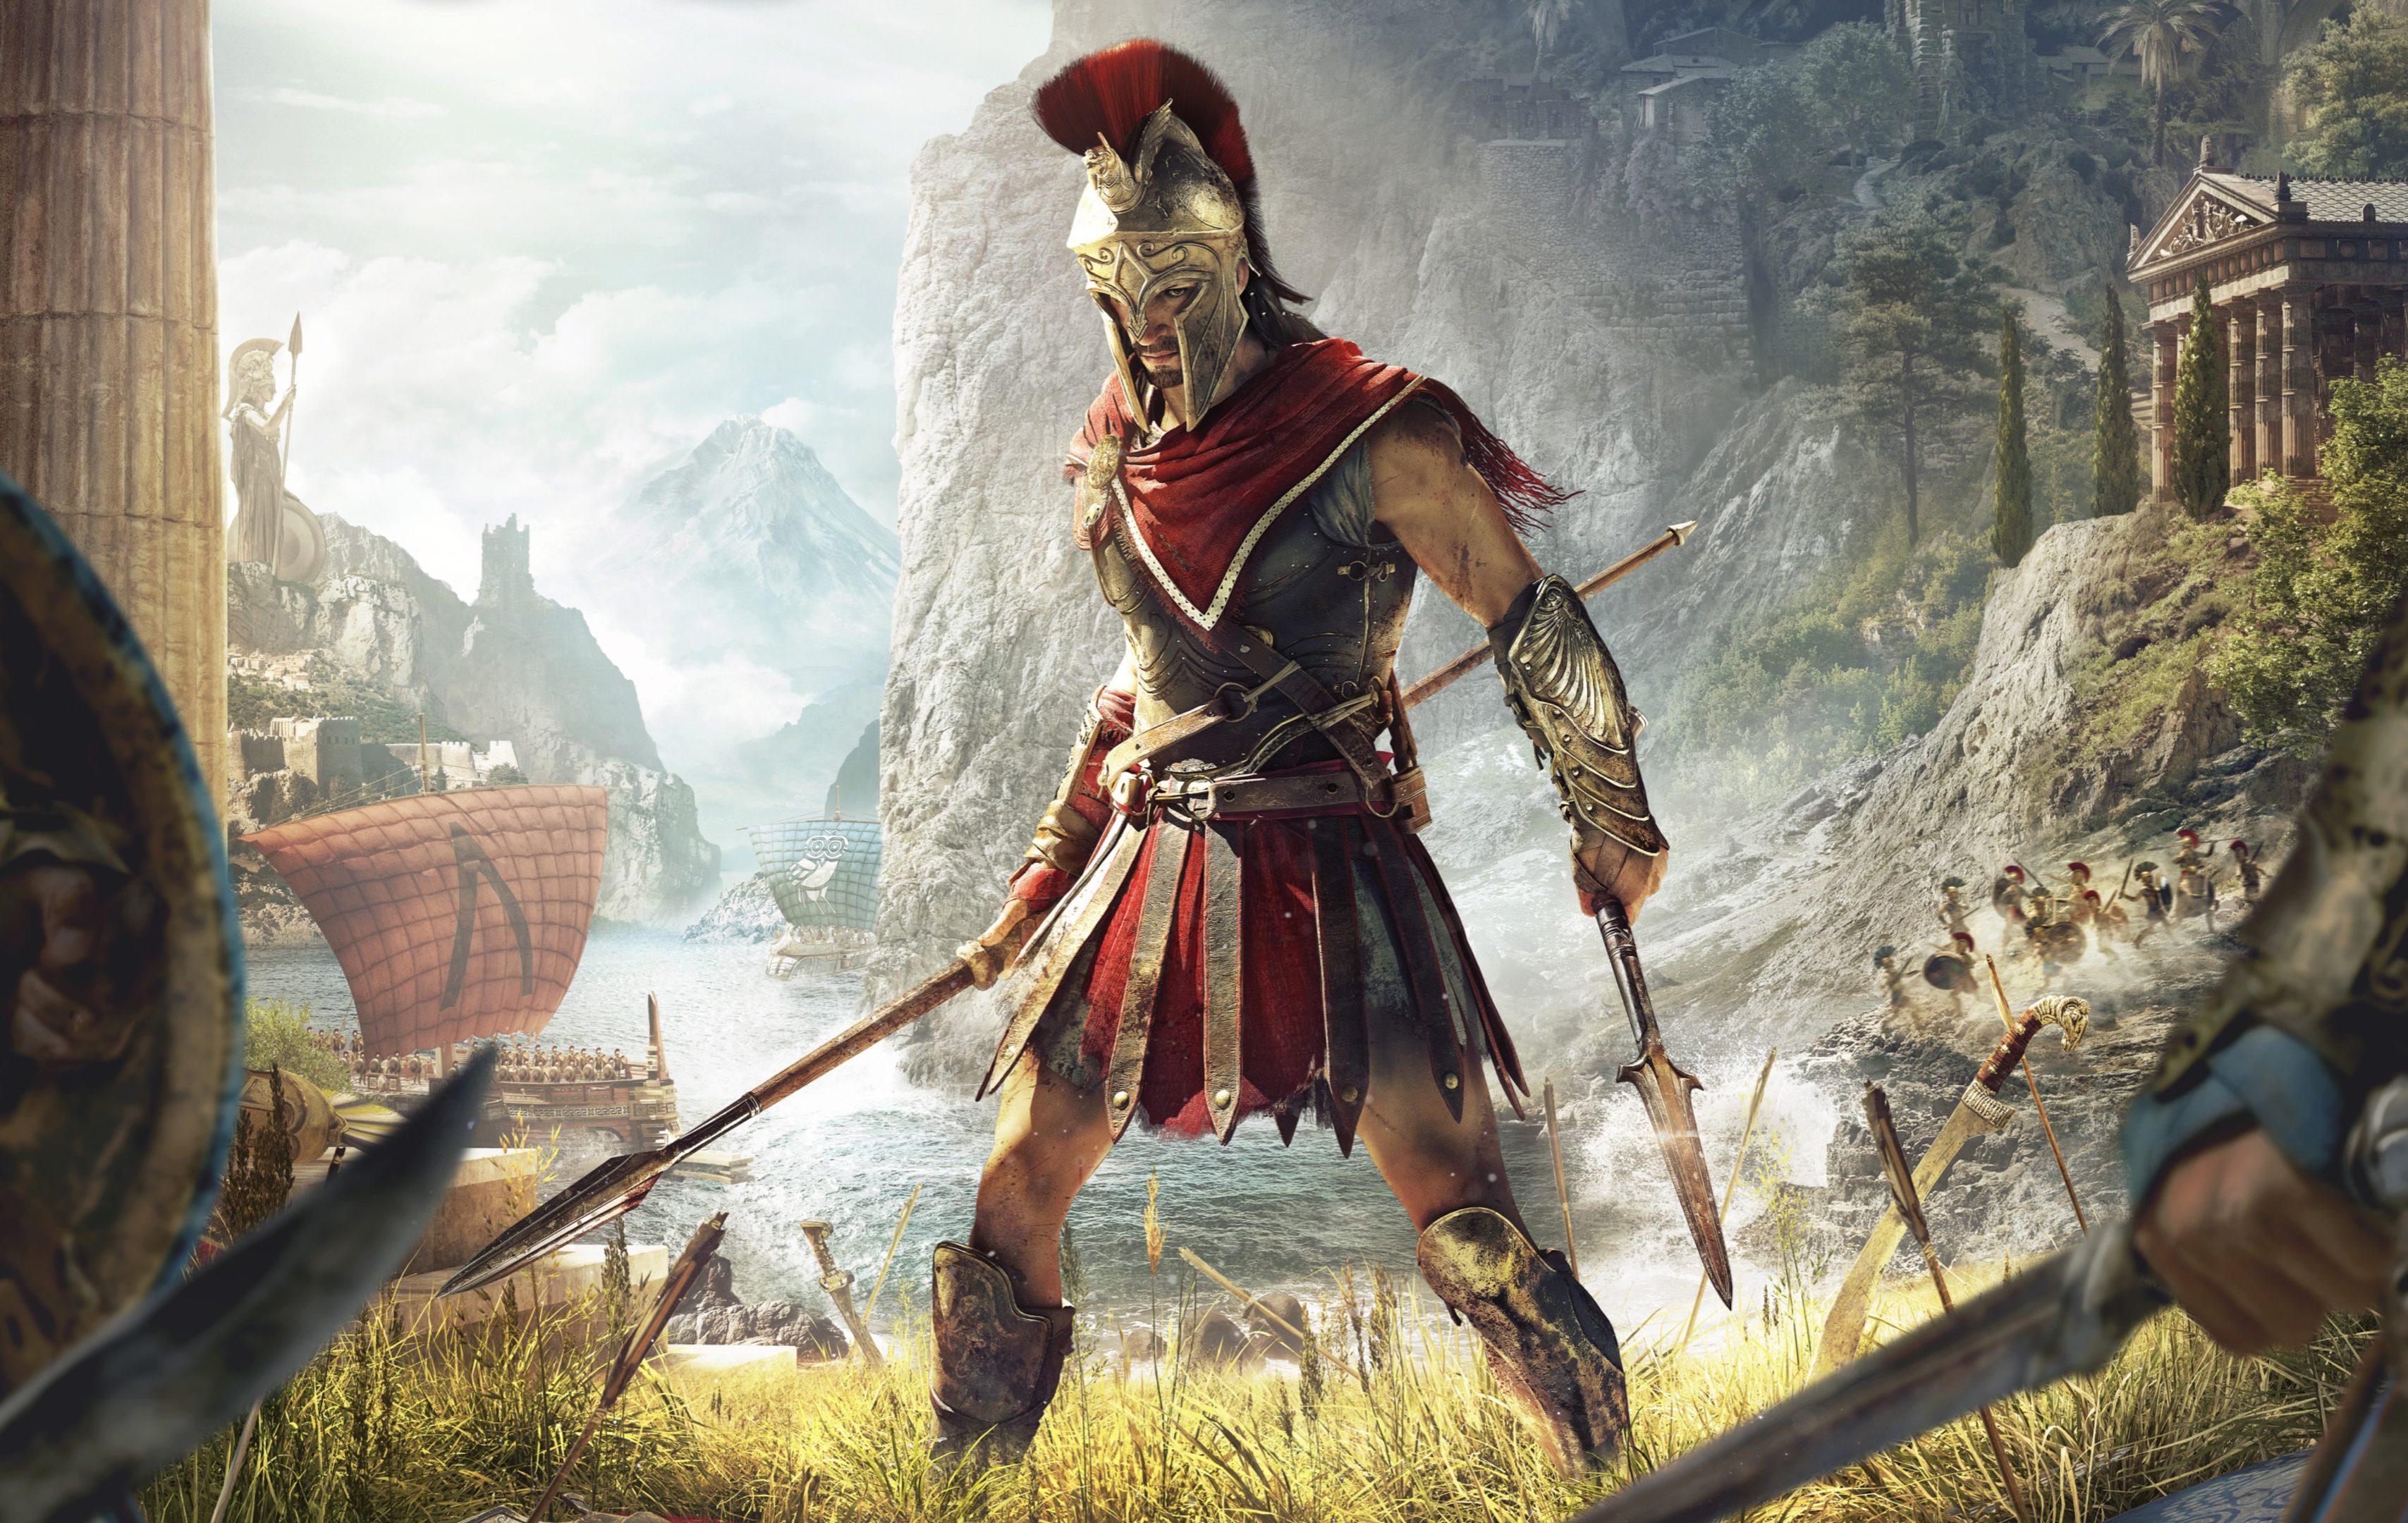 2932x2932 Pubg Android Game 4k Ipad Pro Retina Display Hd: Assassin's Creed Odyssey Game 4K Wallpaper